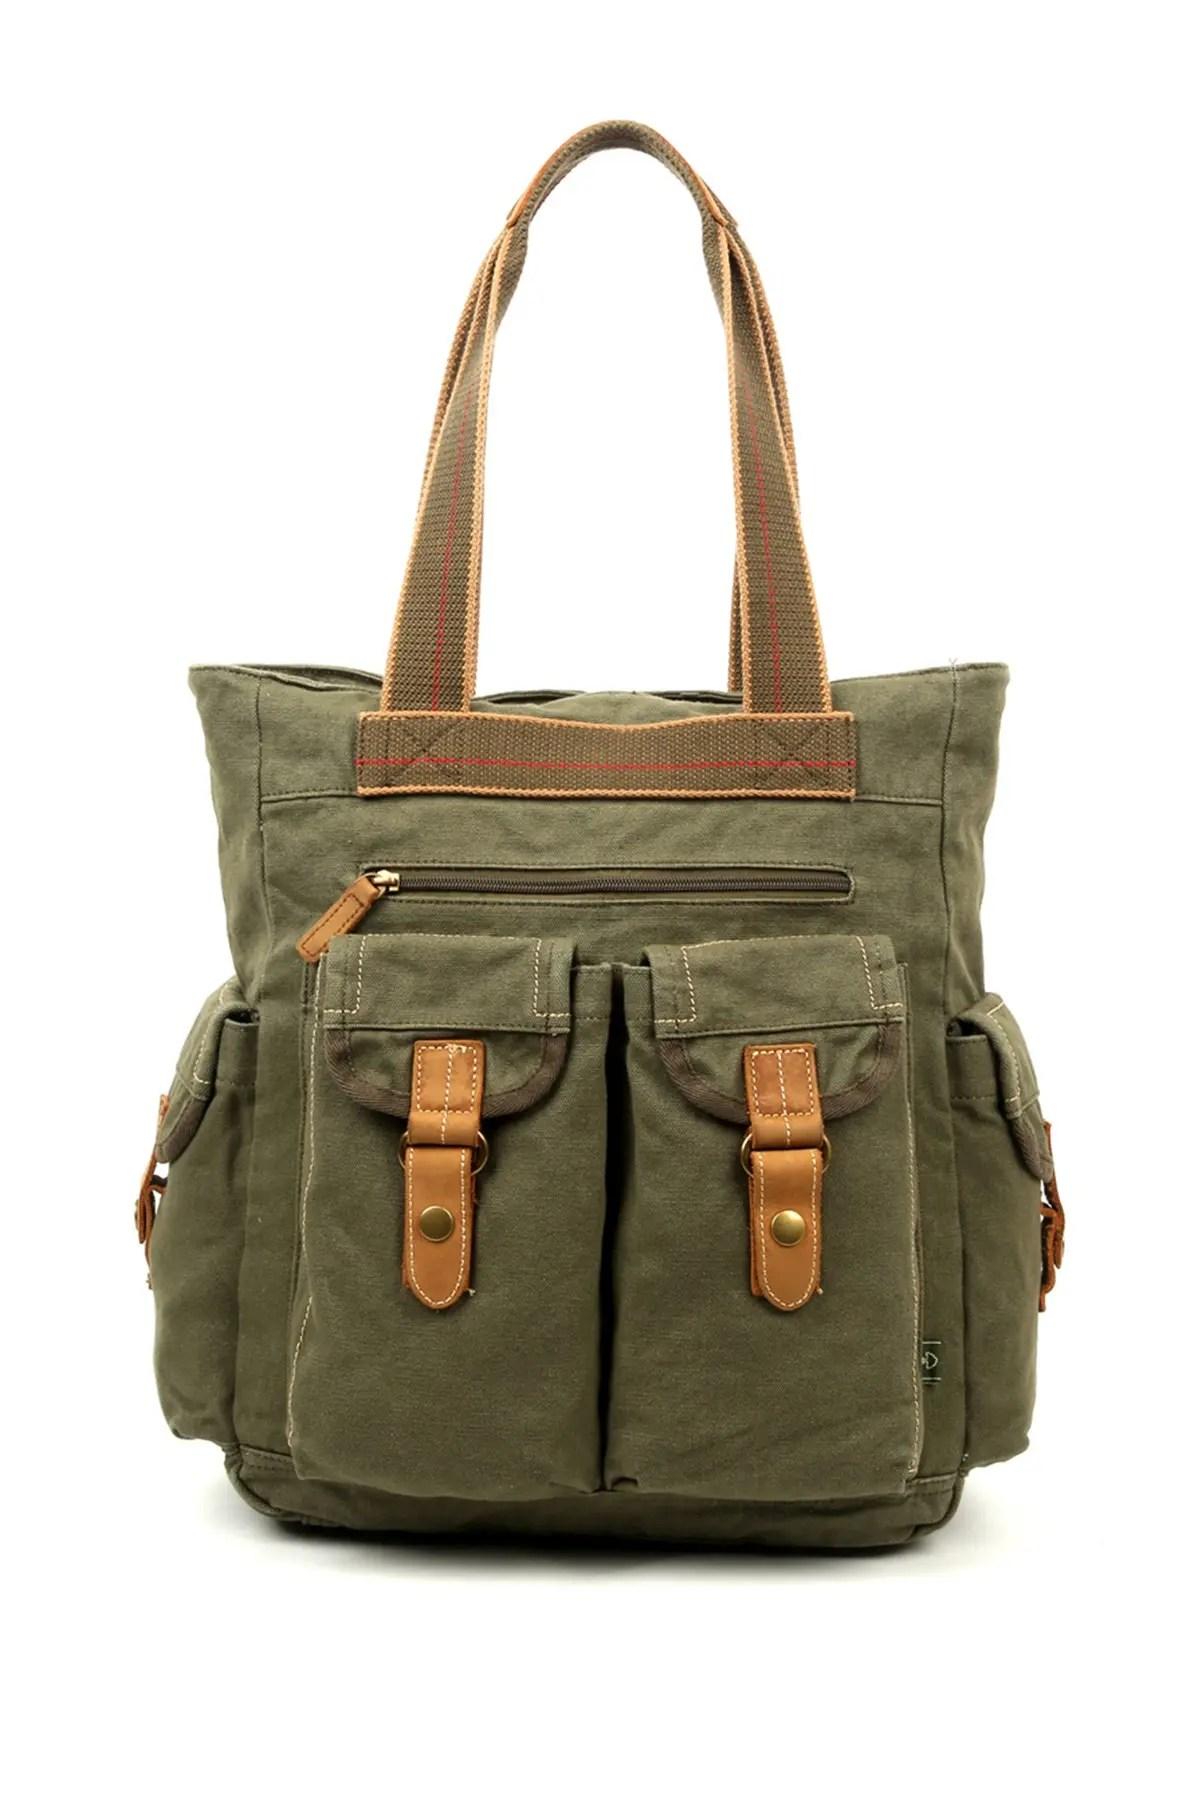 women s tote shopper bags nordstrom